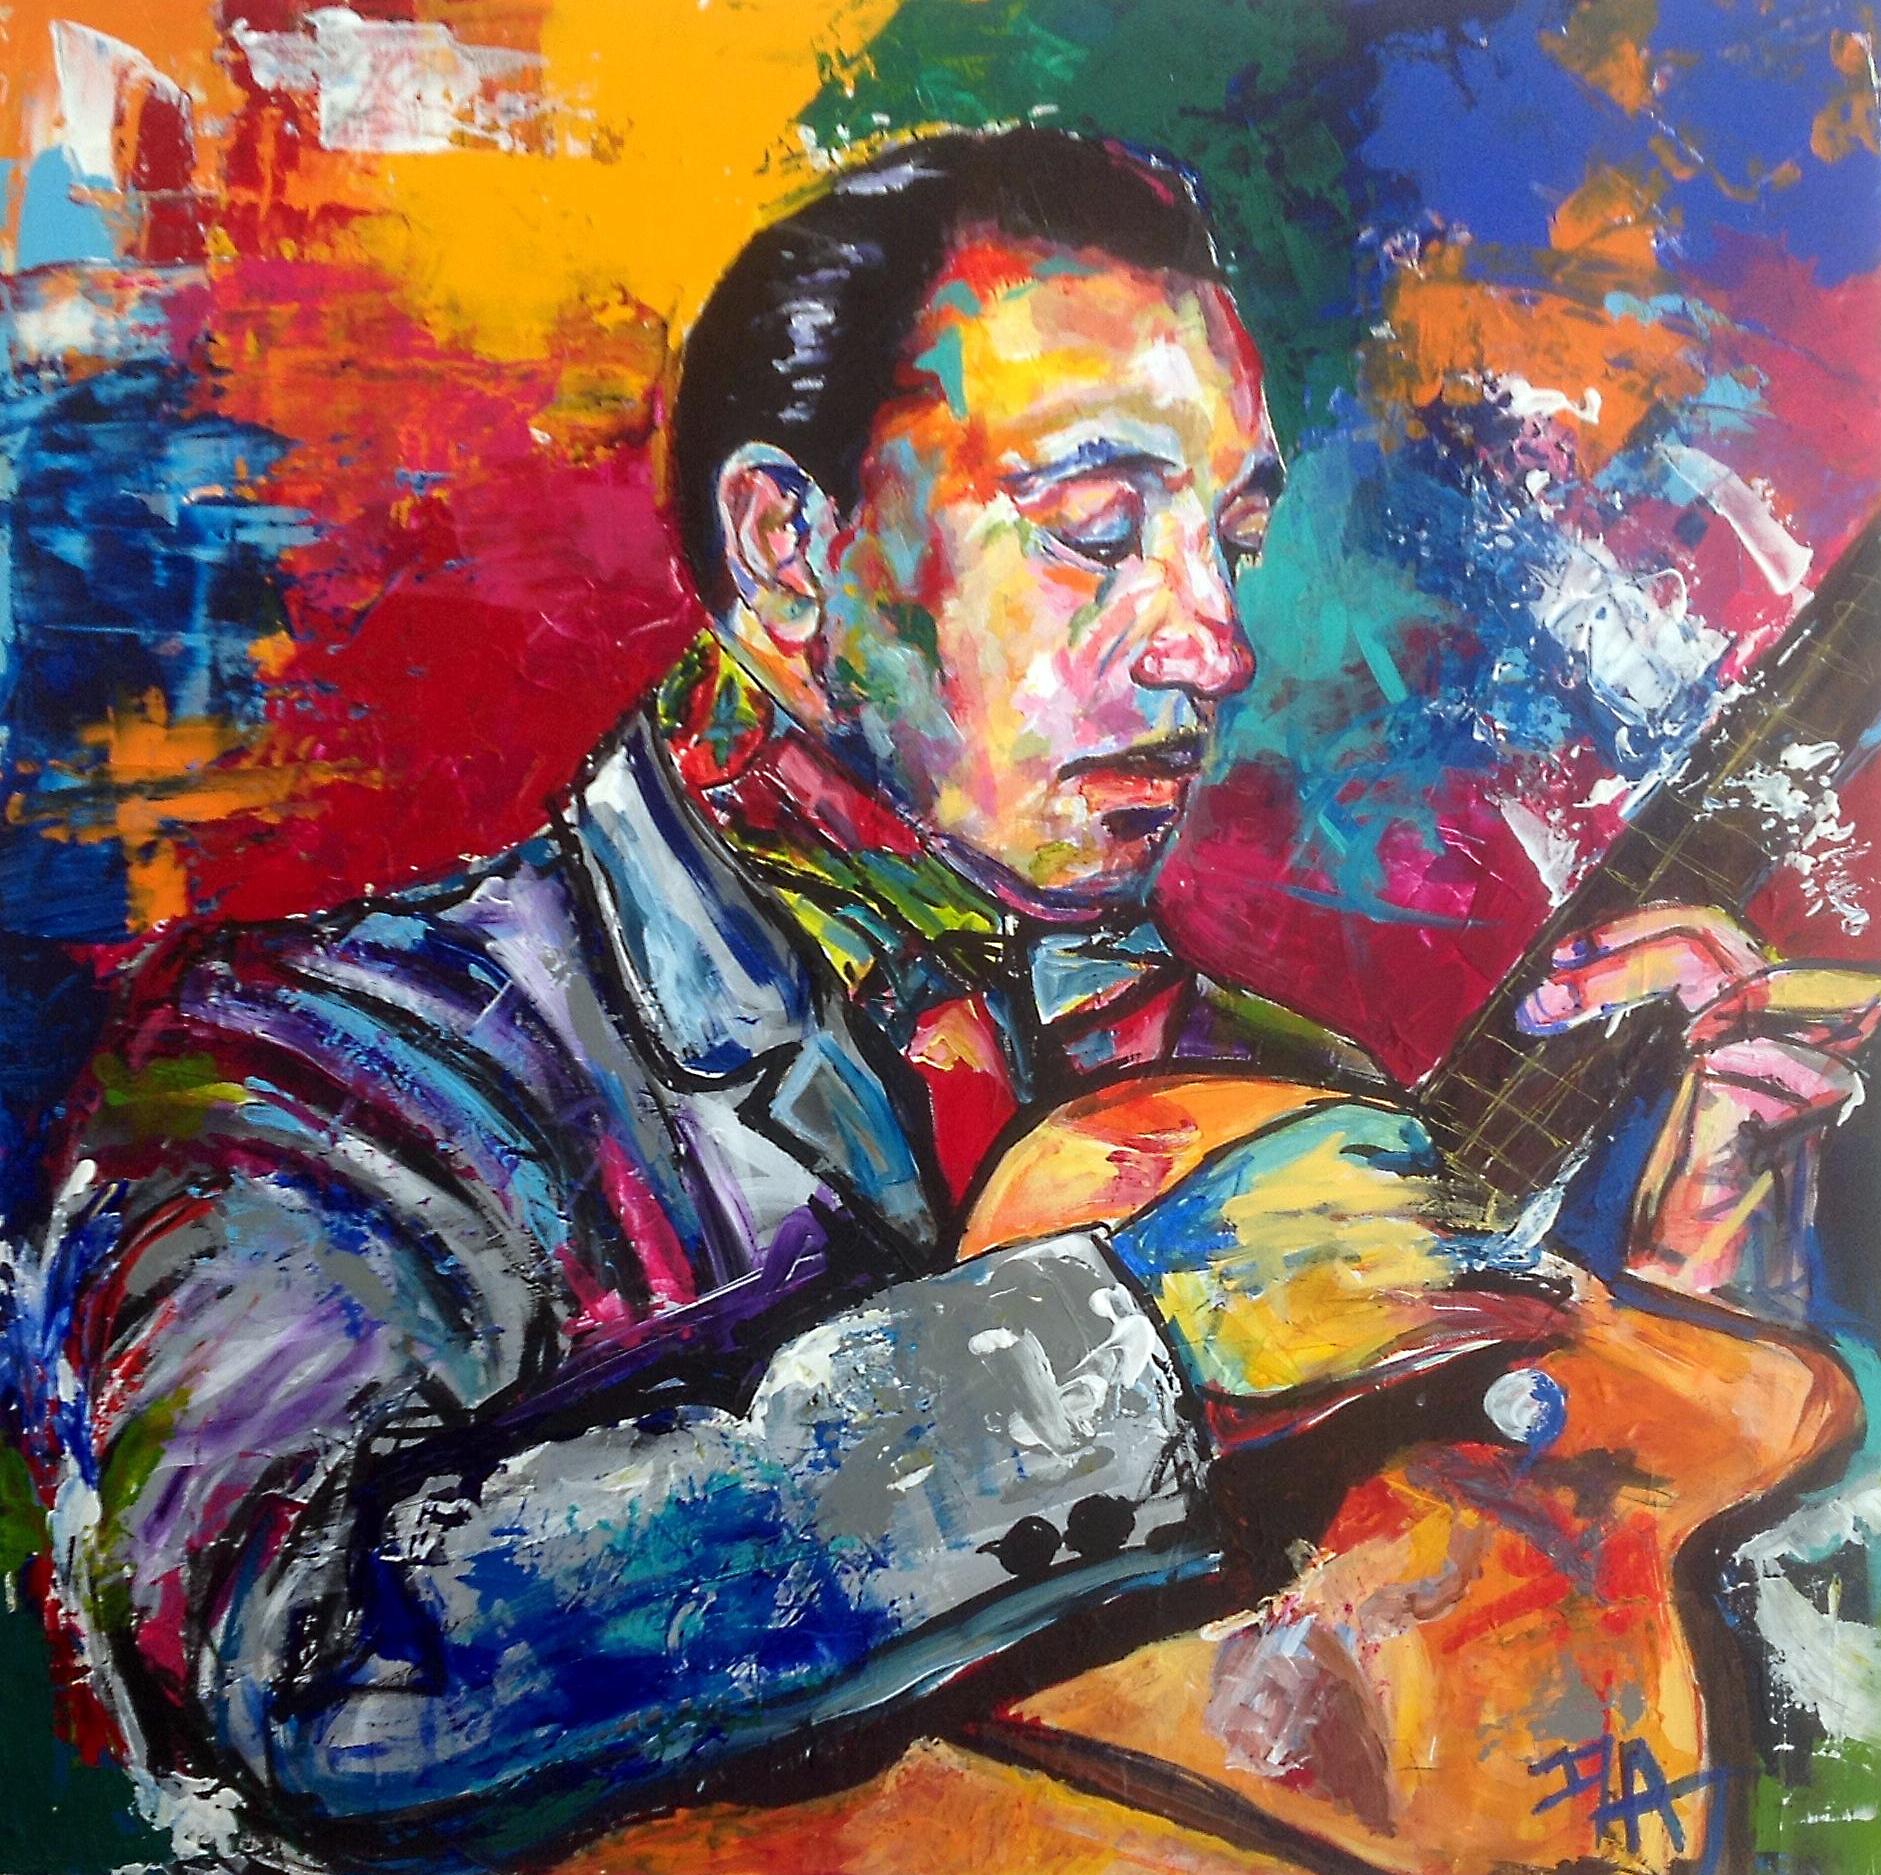 Iza, artiste peintre